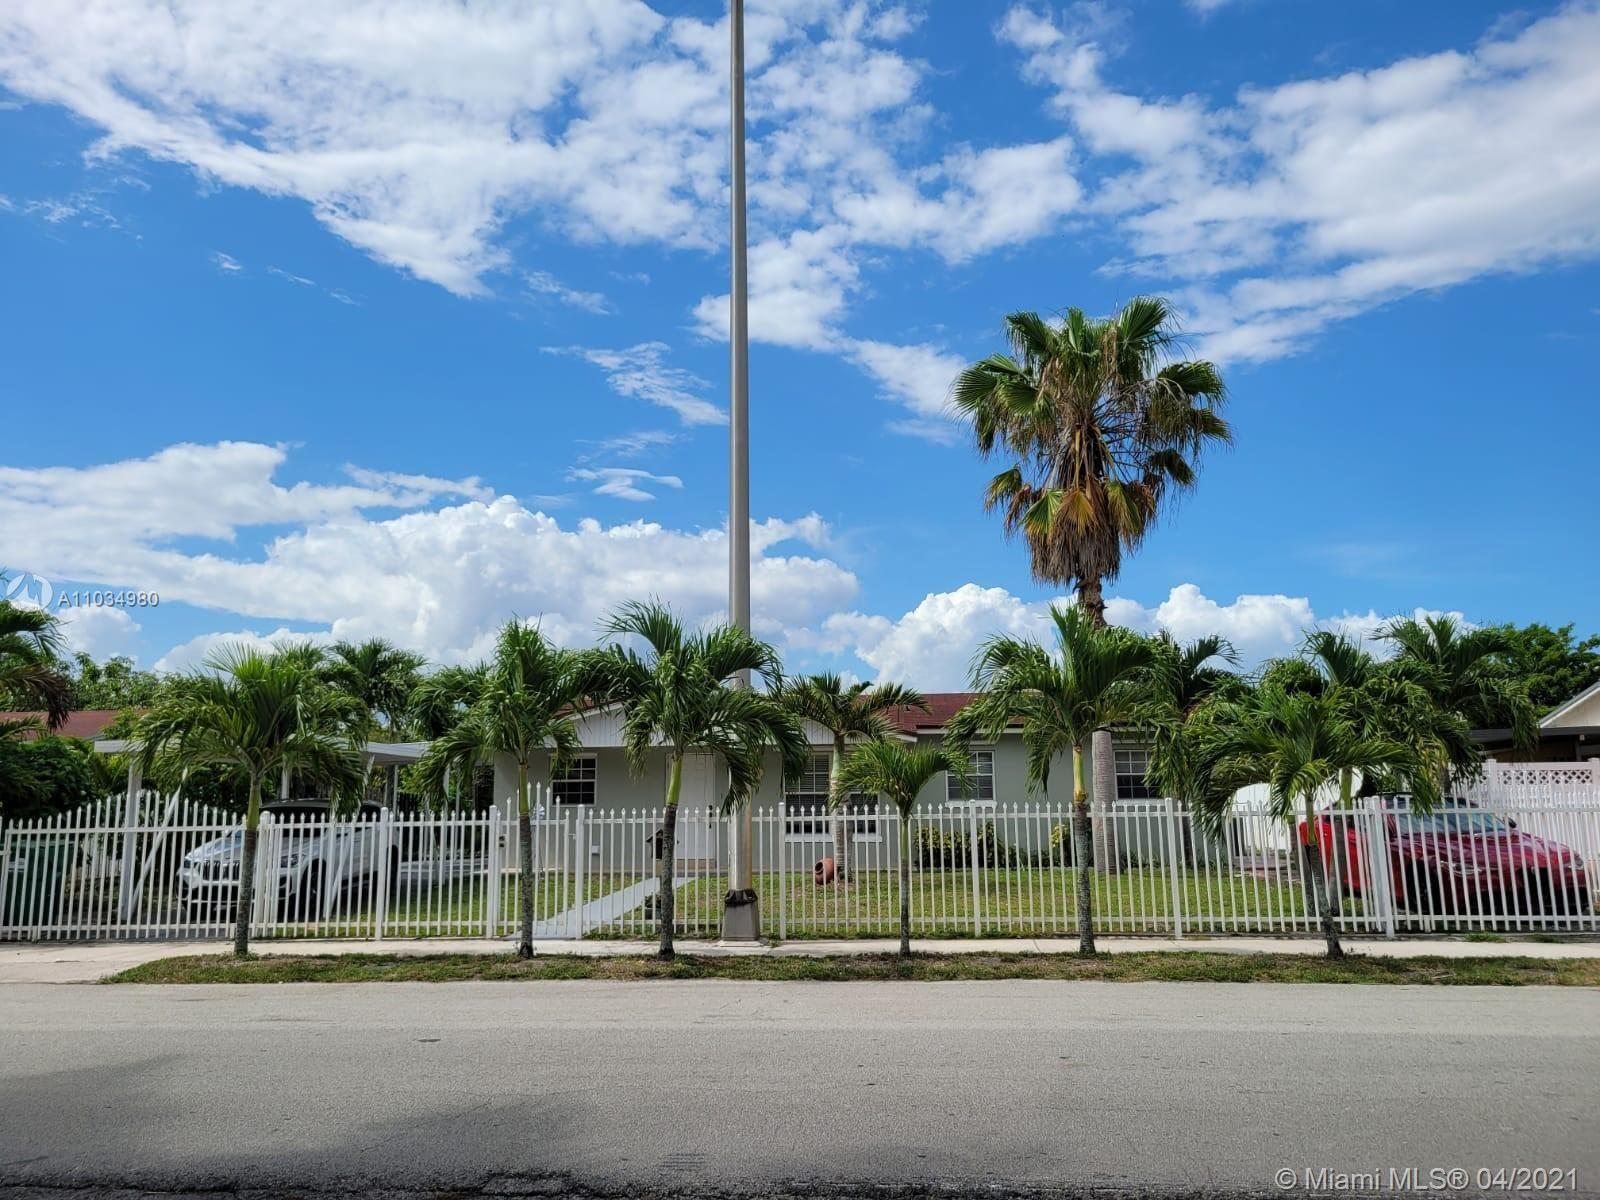 4481 NW 199th St, Miami Gardens, FL 33055 - #: A11034980